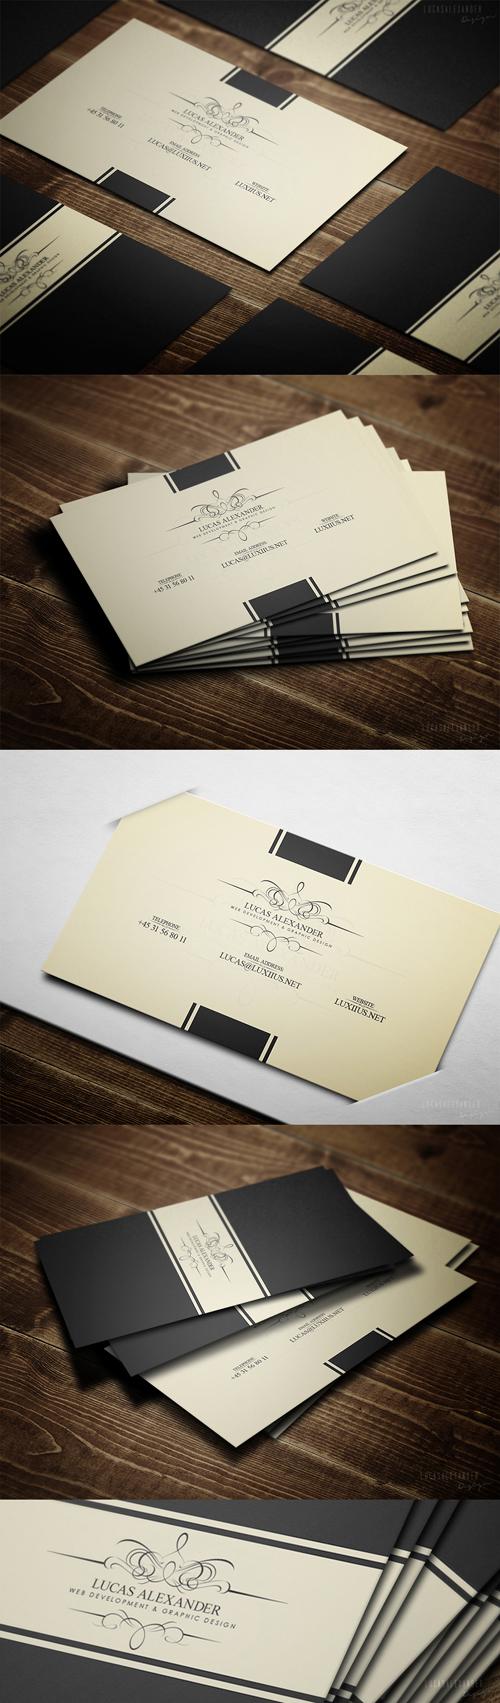 Business Cards Design-25